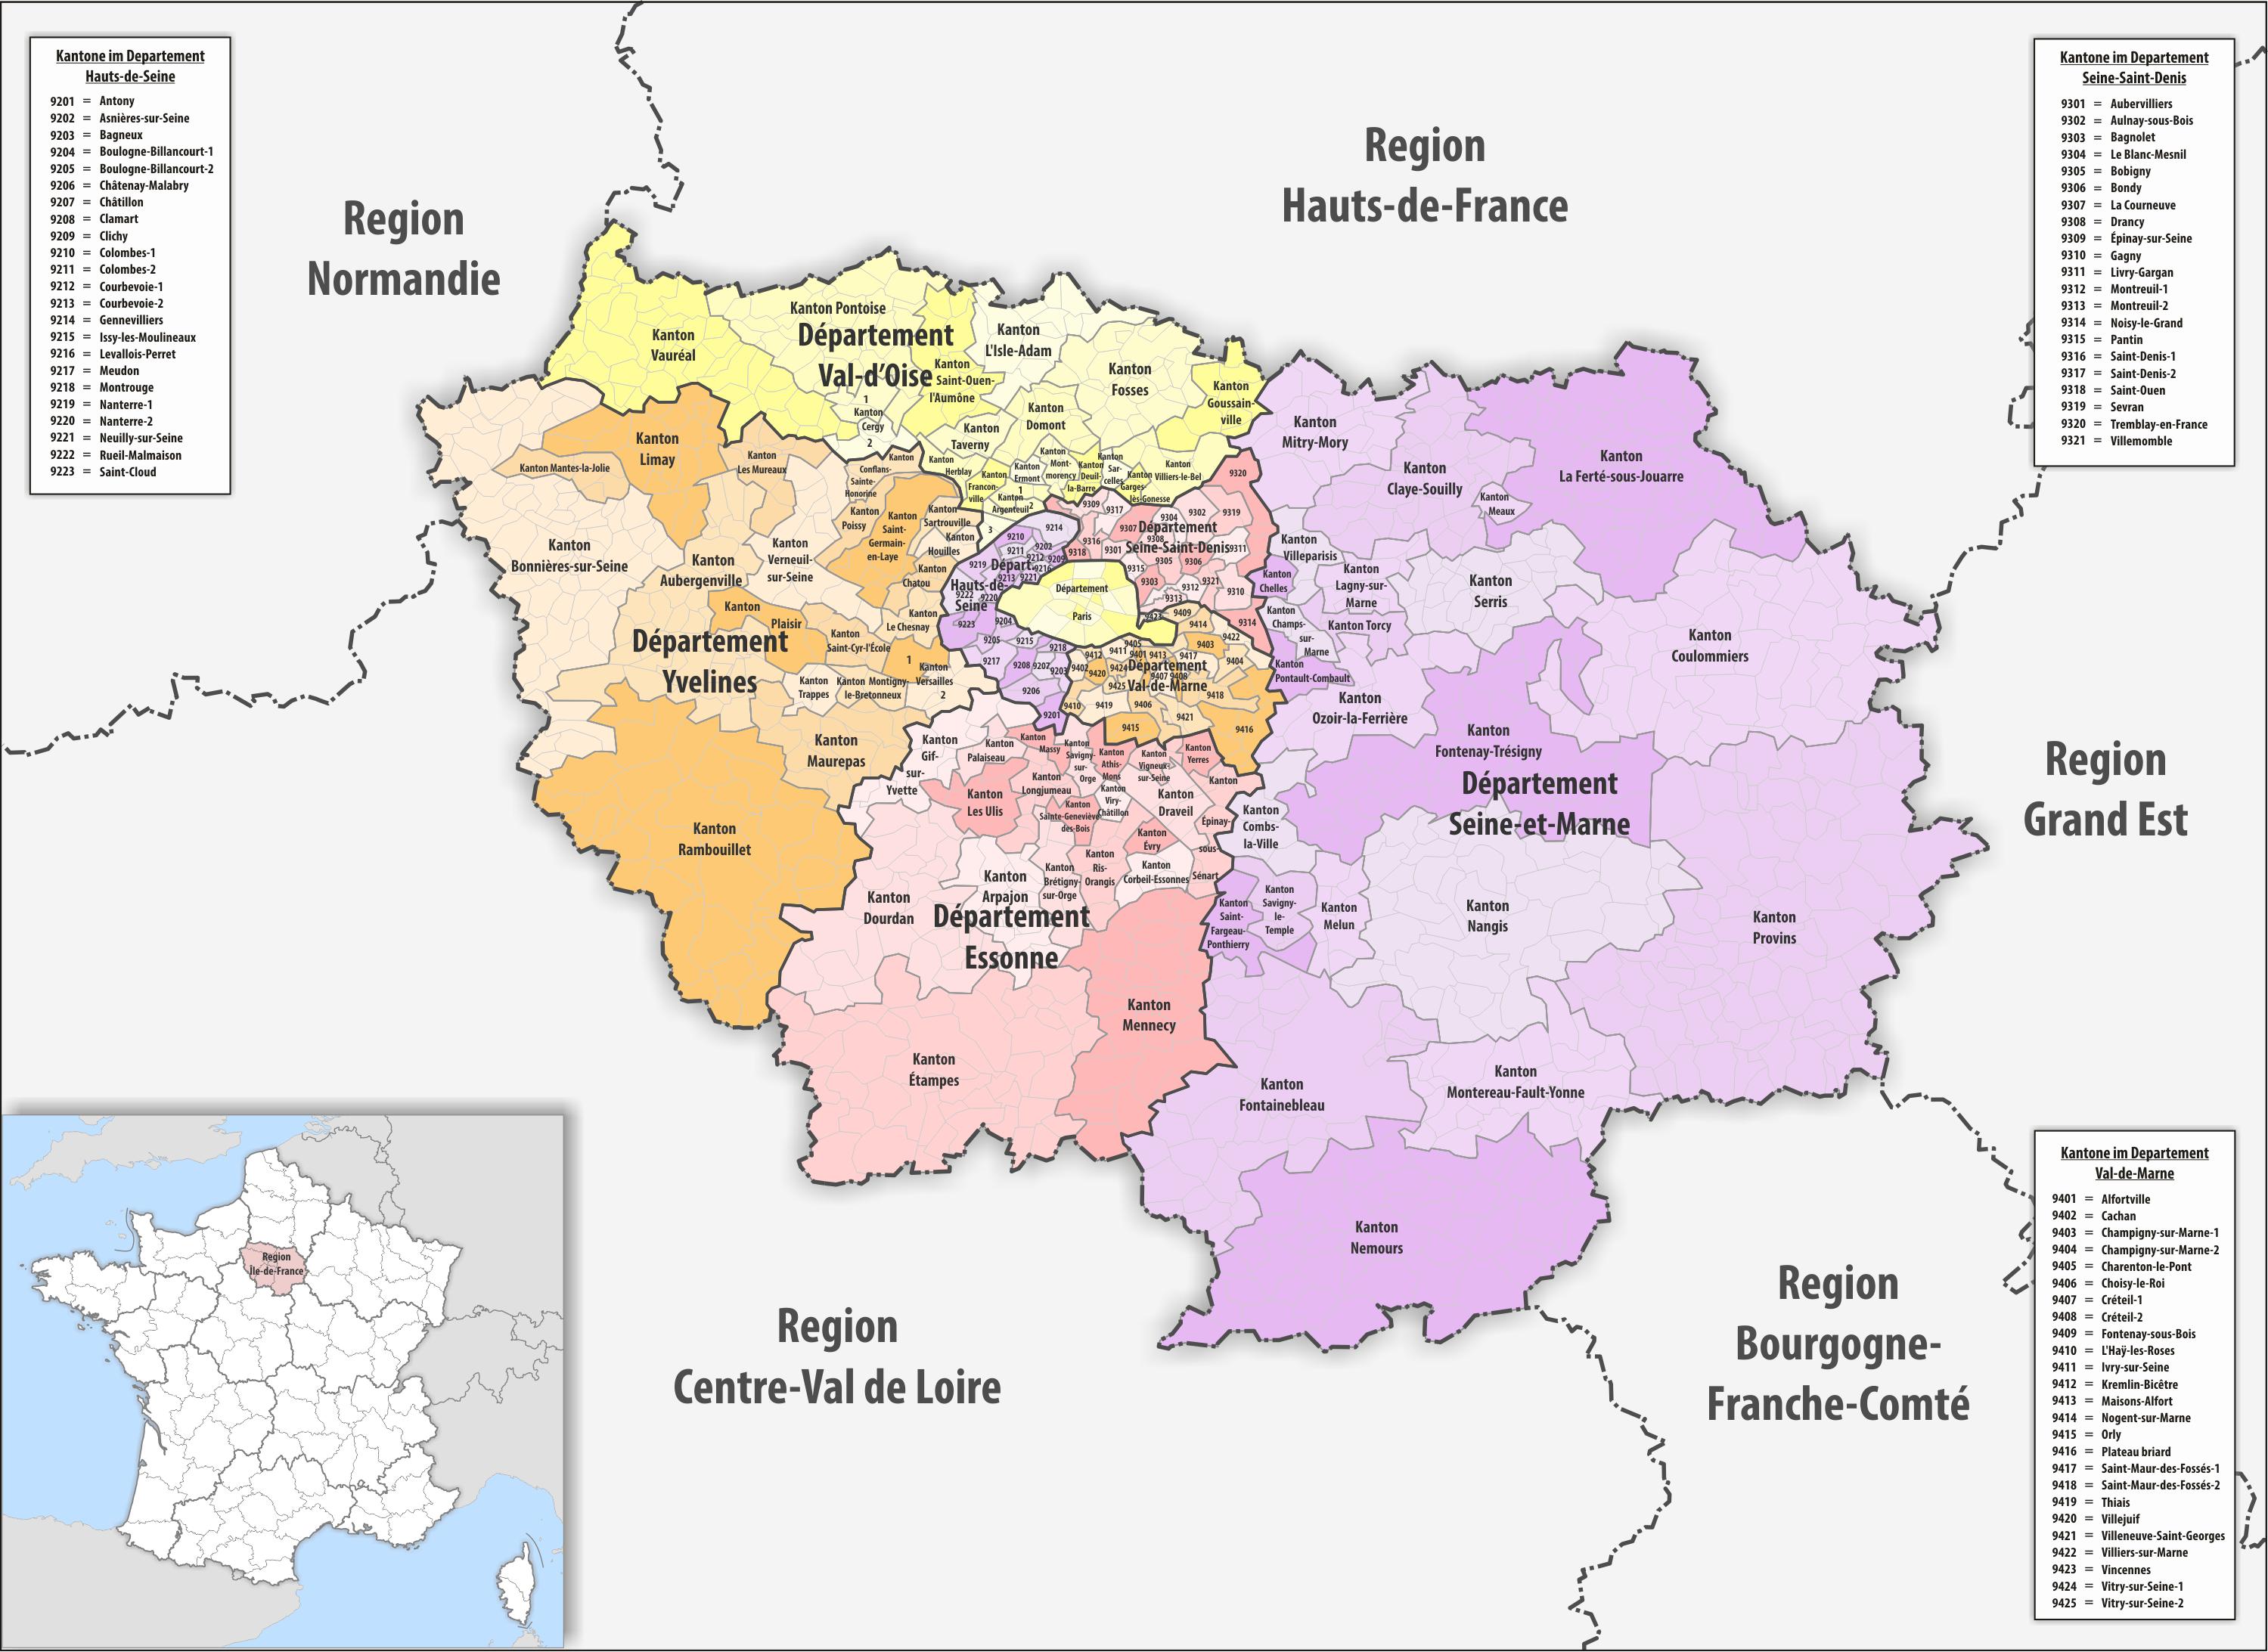 Region de france 2016